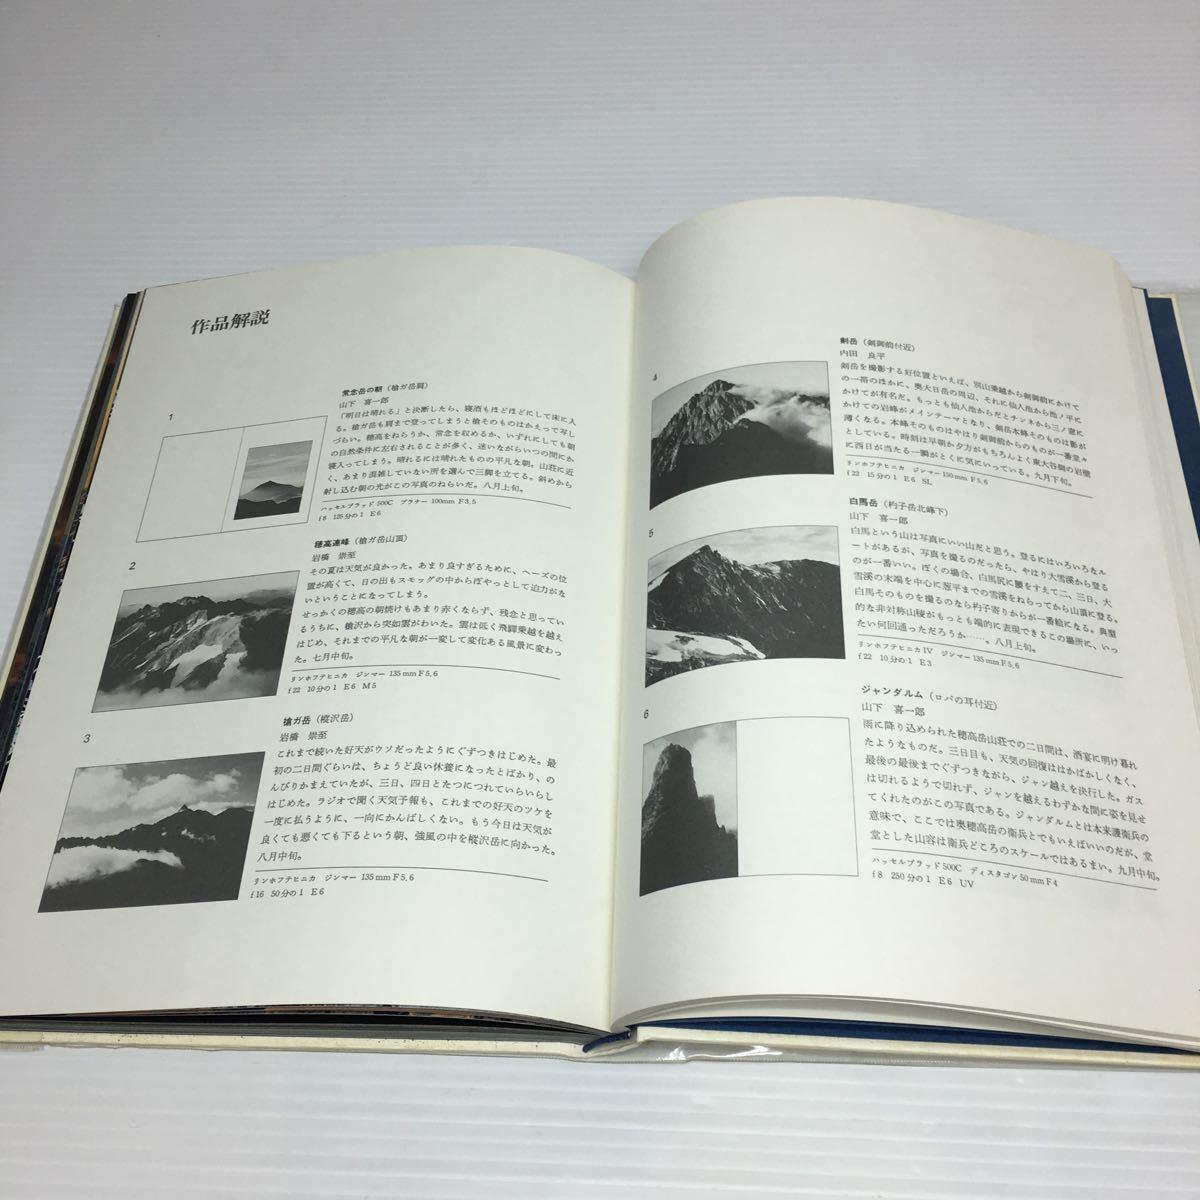 x2/北アルプス 日本山岳写真集団 昭和54年初版 定価8000円_画像9